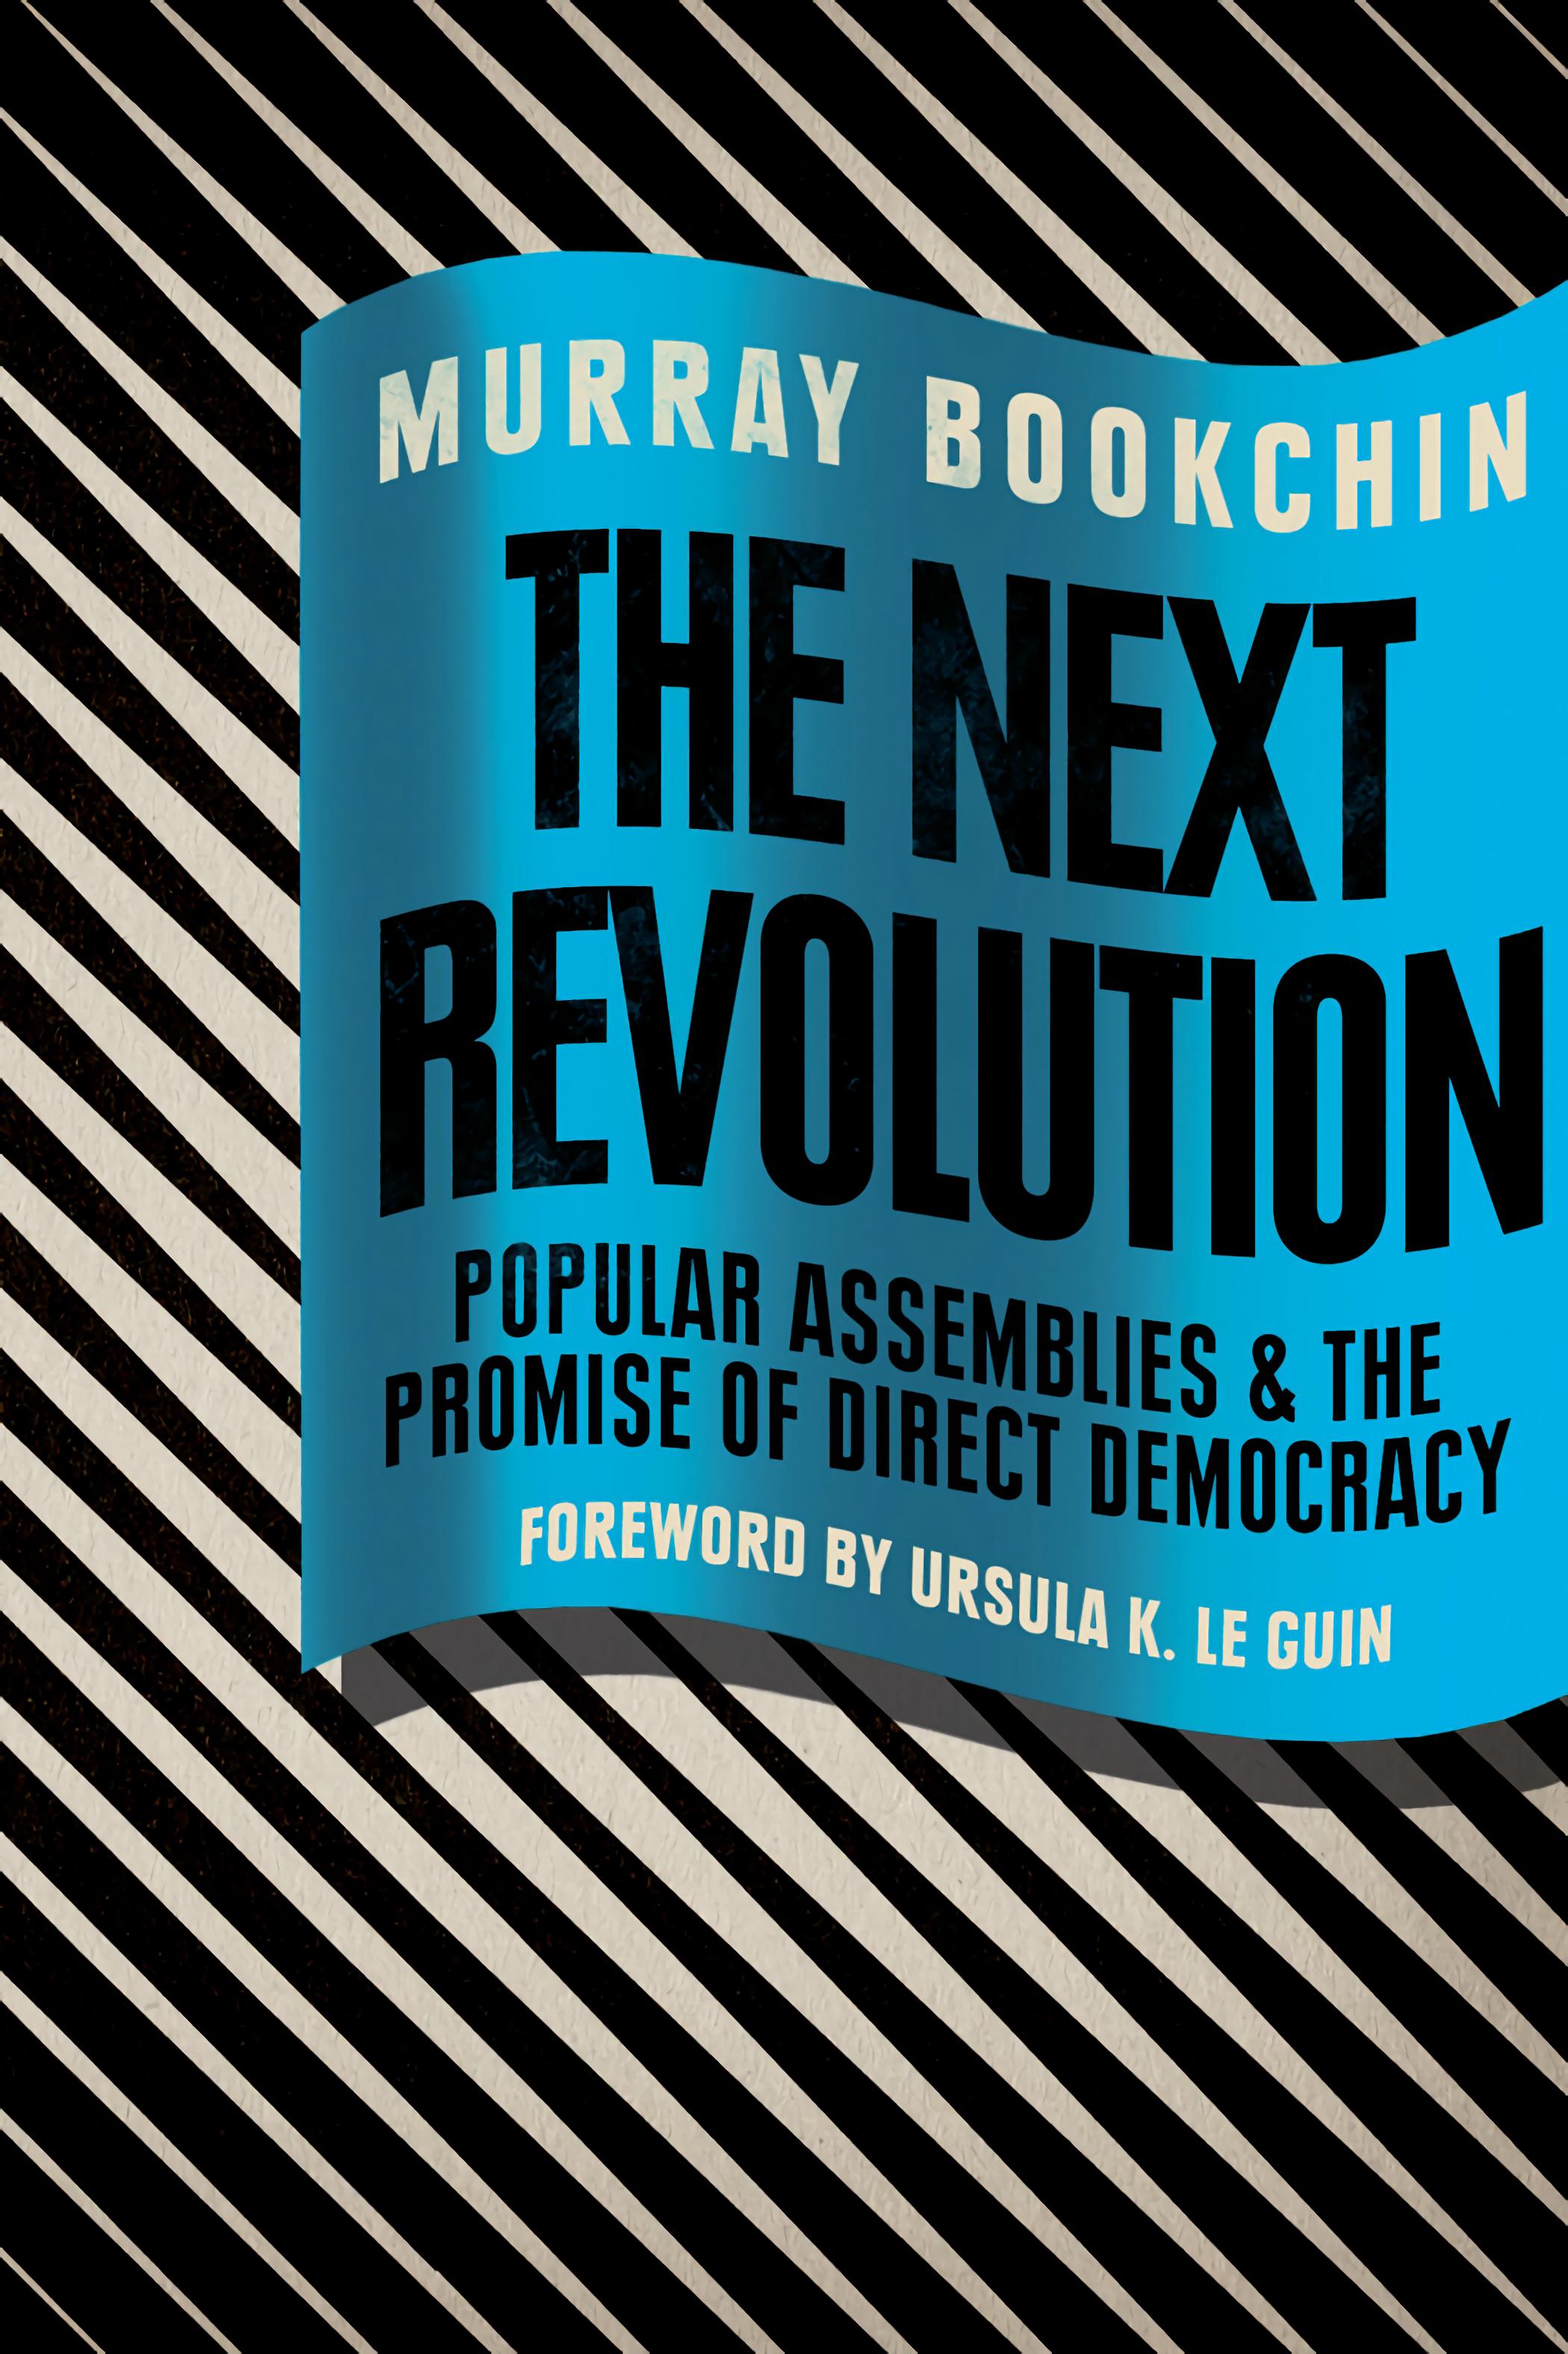 The Next Revolution.